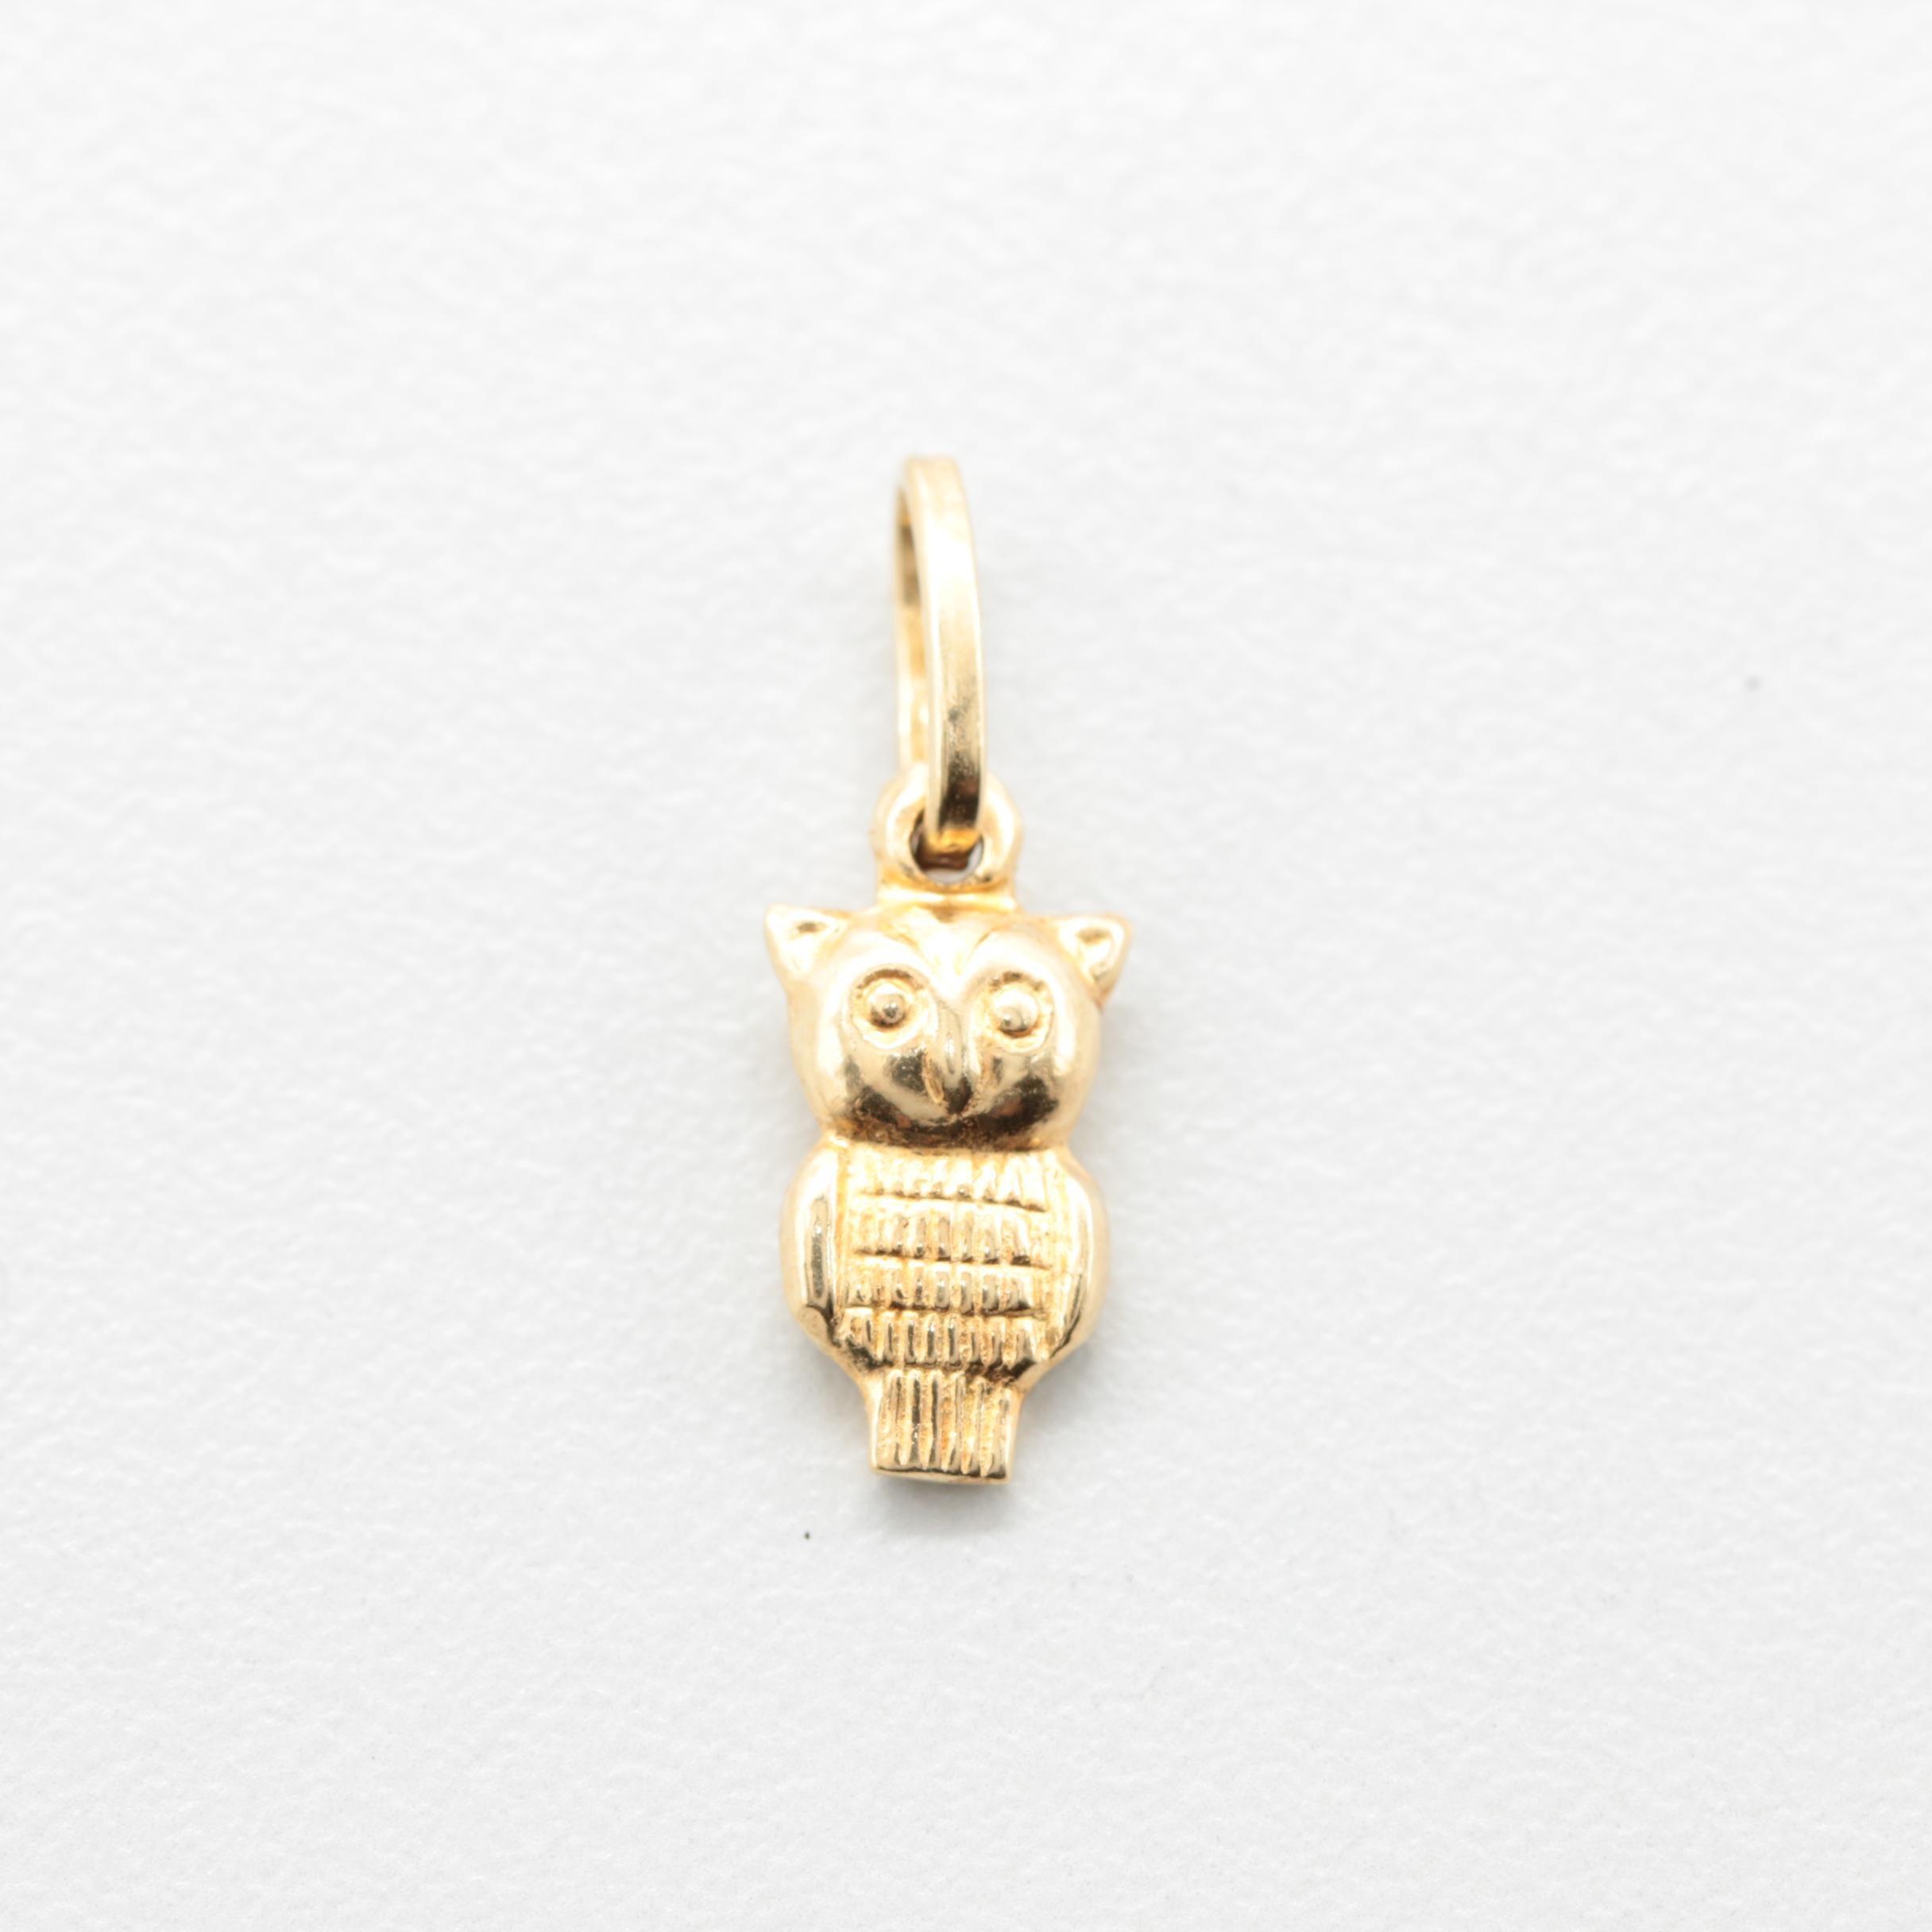 18K Yellow Gold Owl Charm Pendant